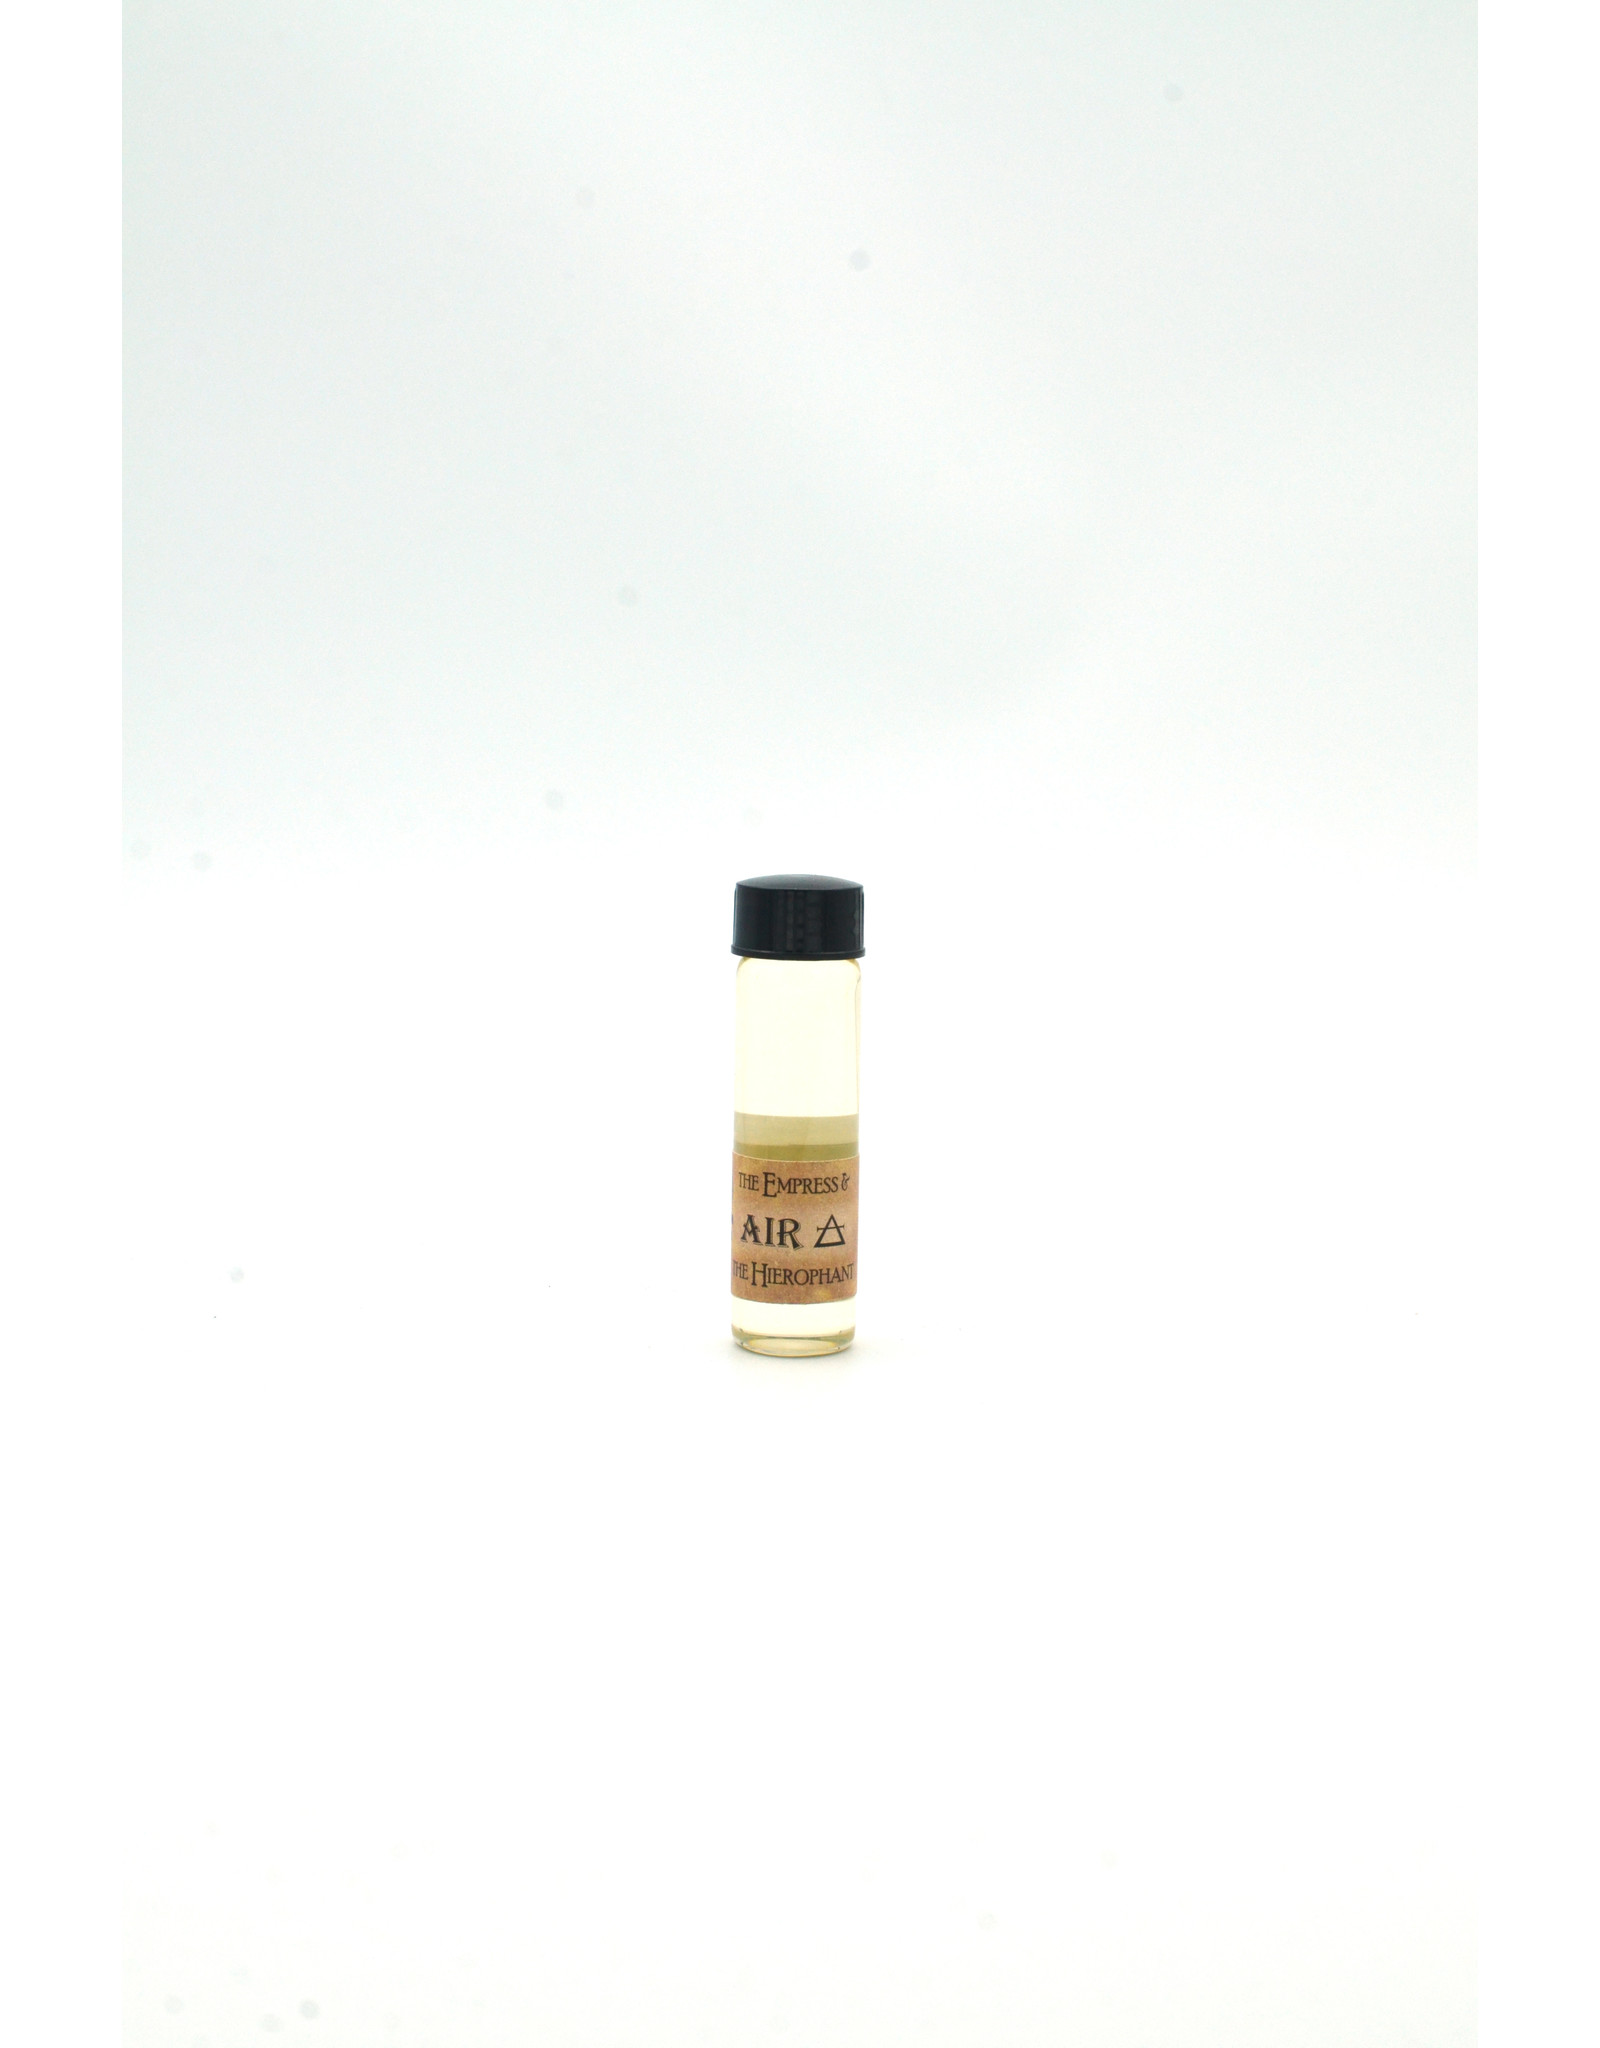 Element of Air Magickal Oil 2 Dram Bottle